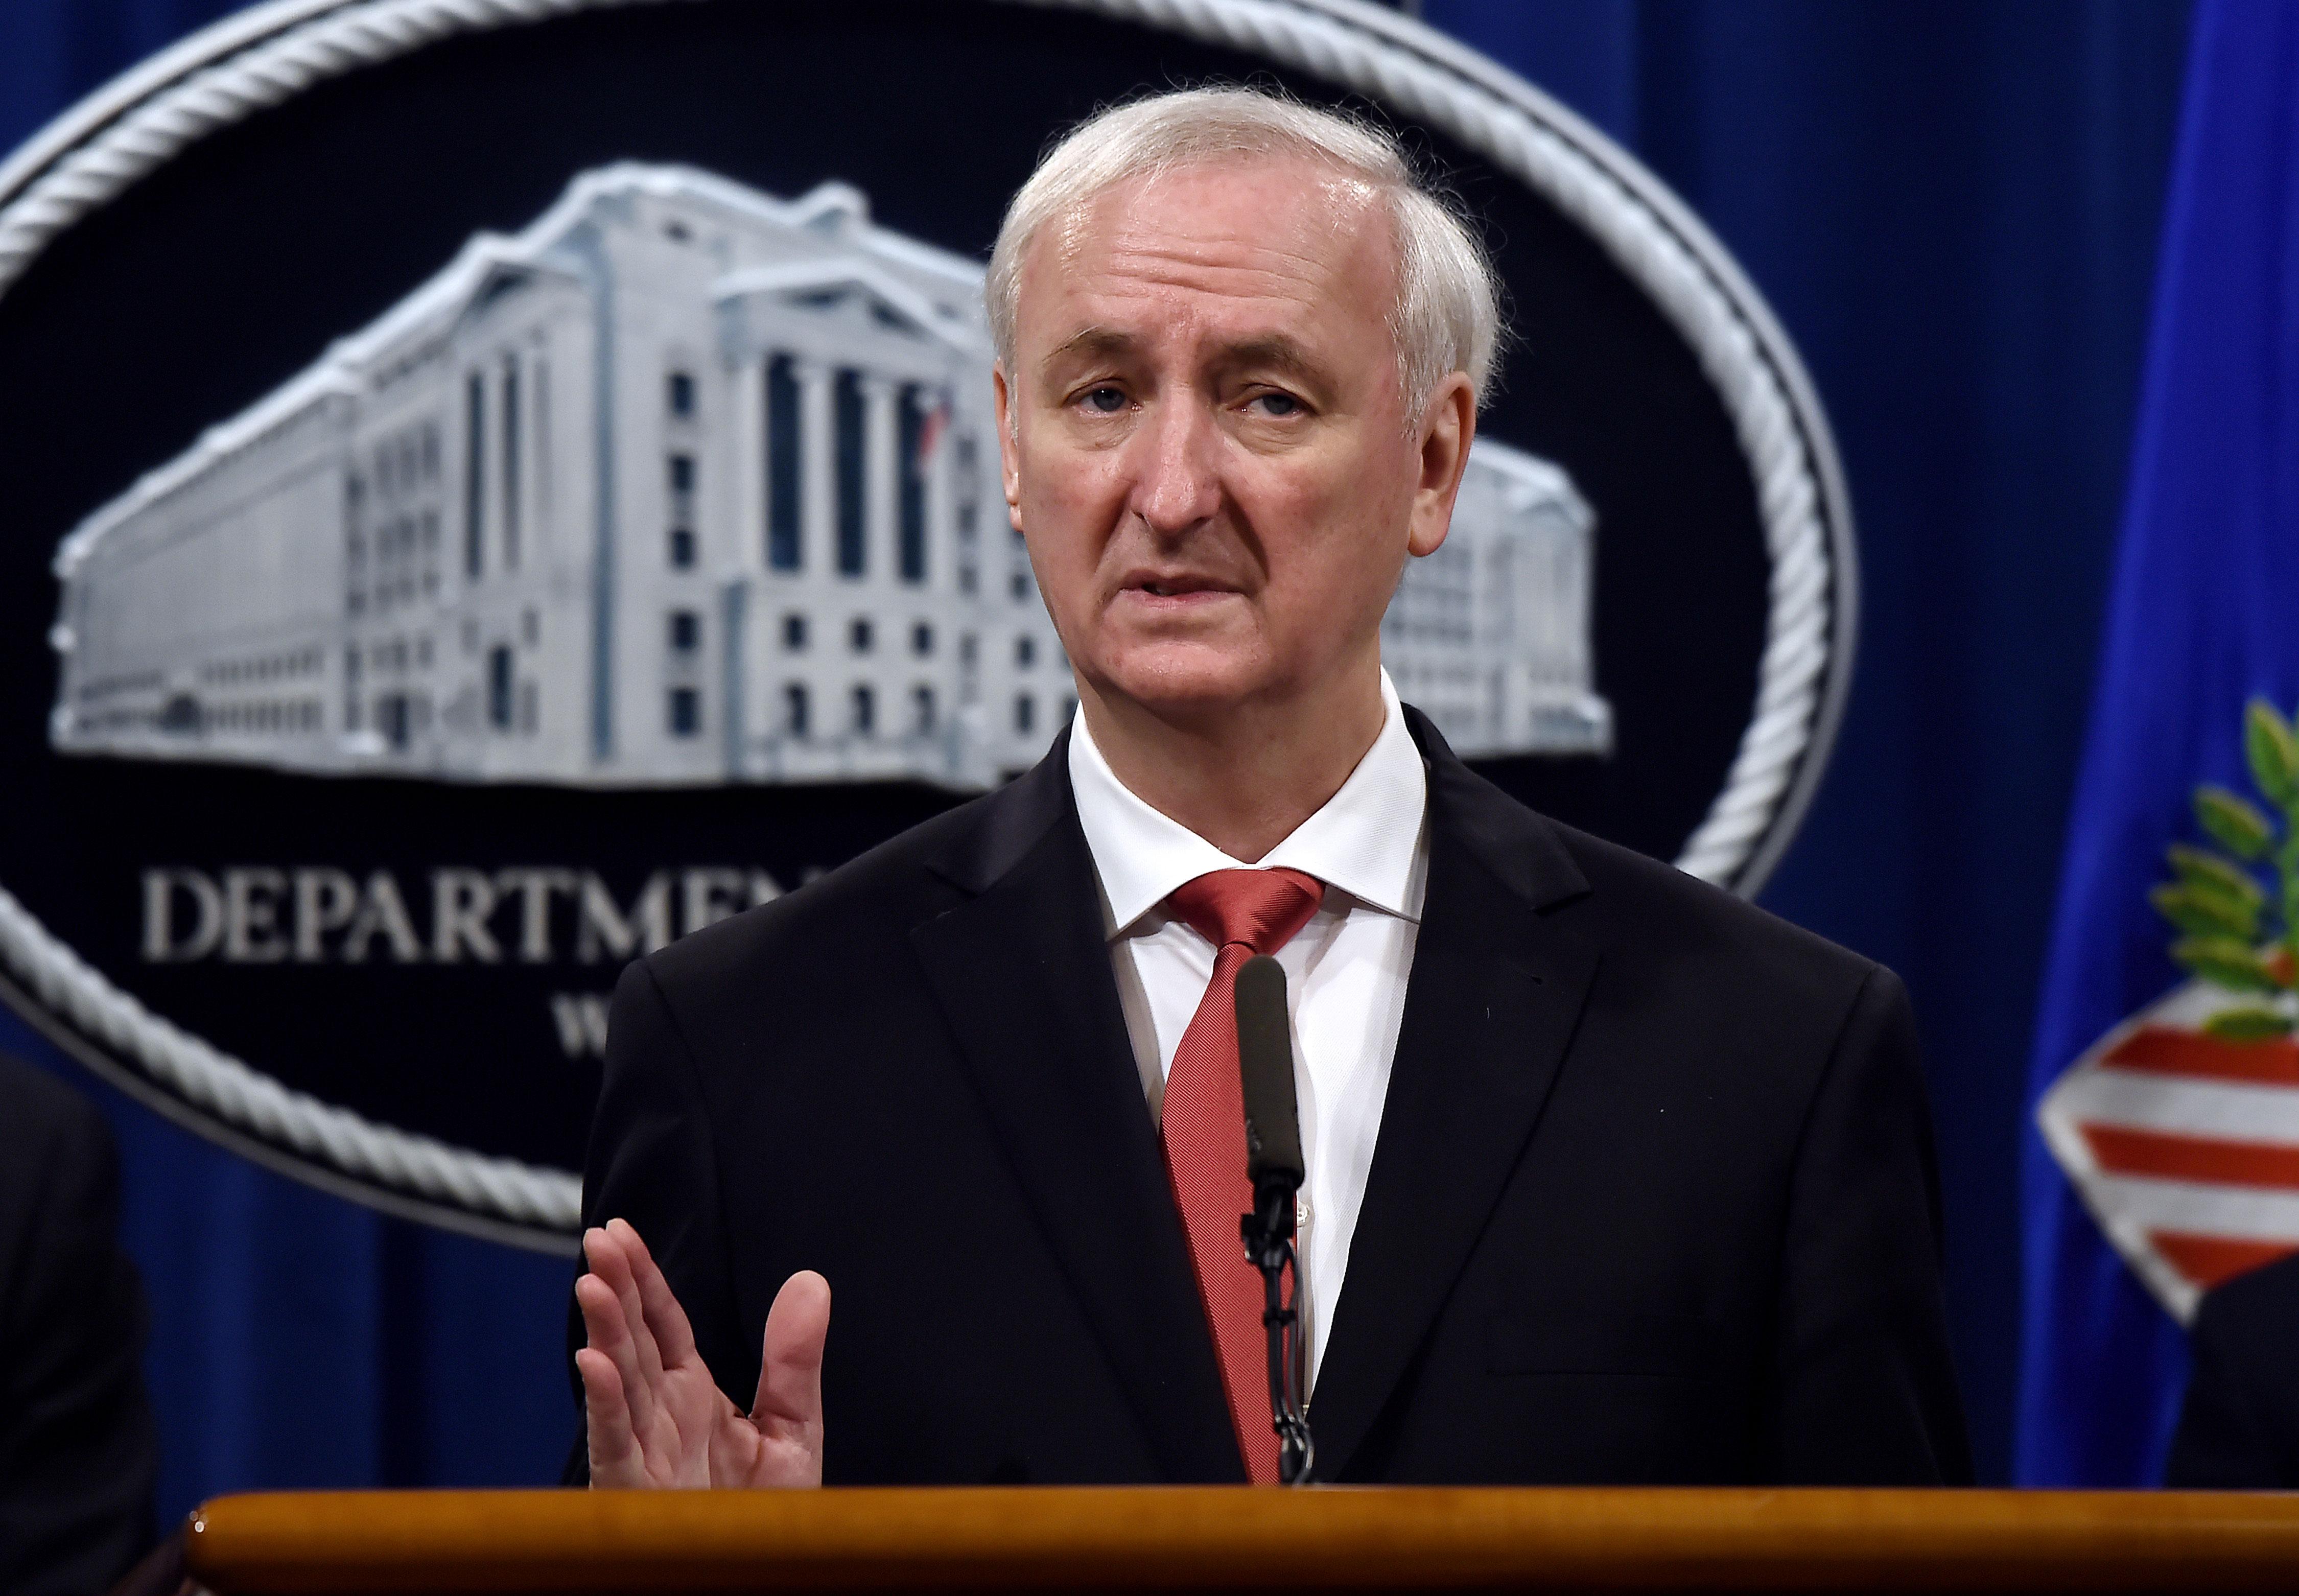 Then-Deputy Attorney General Jeffrey Rosen speaks at a press conference in Washington, DC, on September 22, 2020.